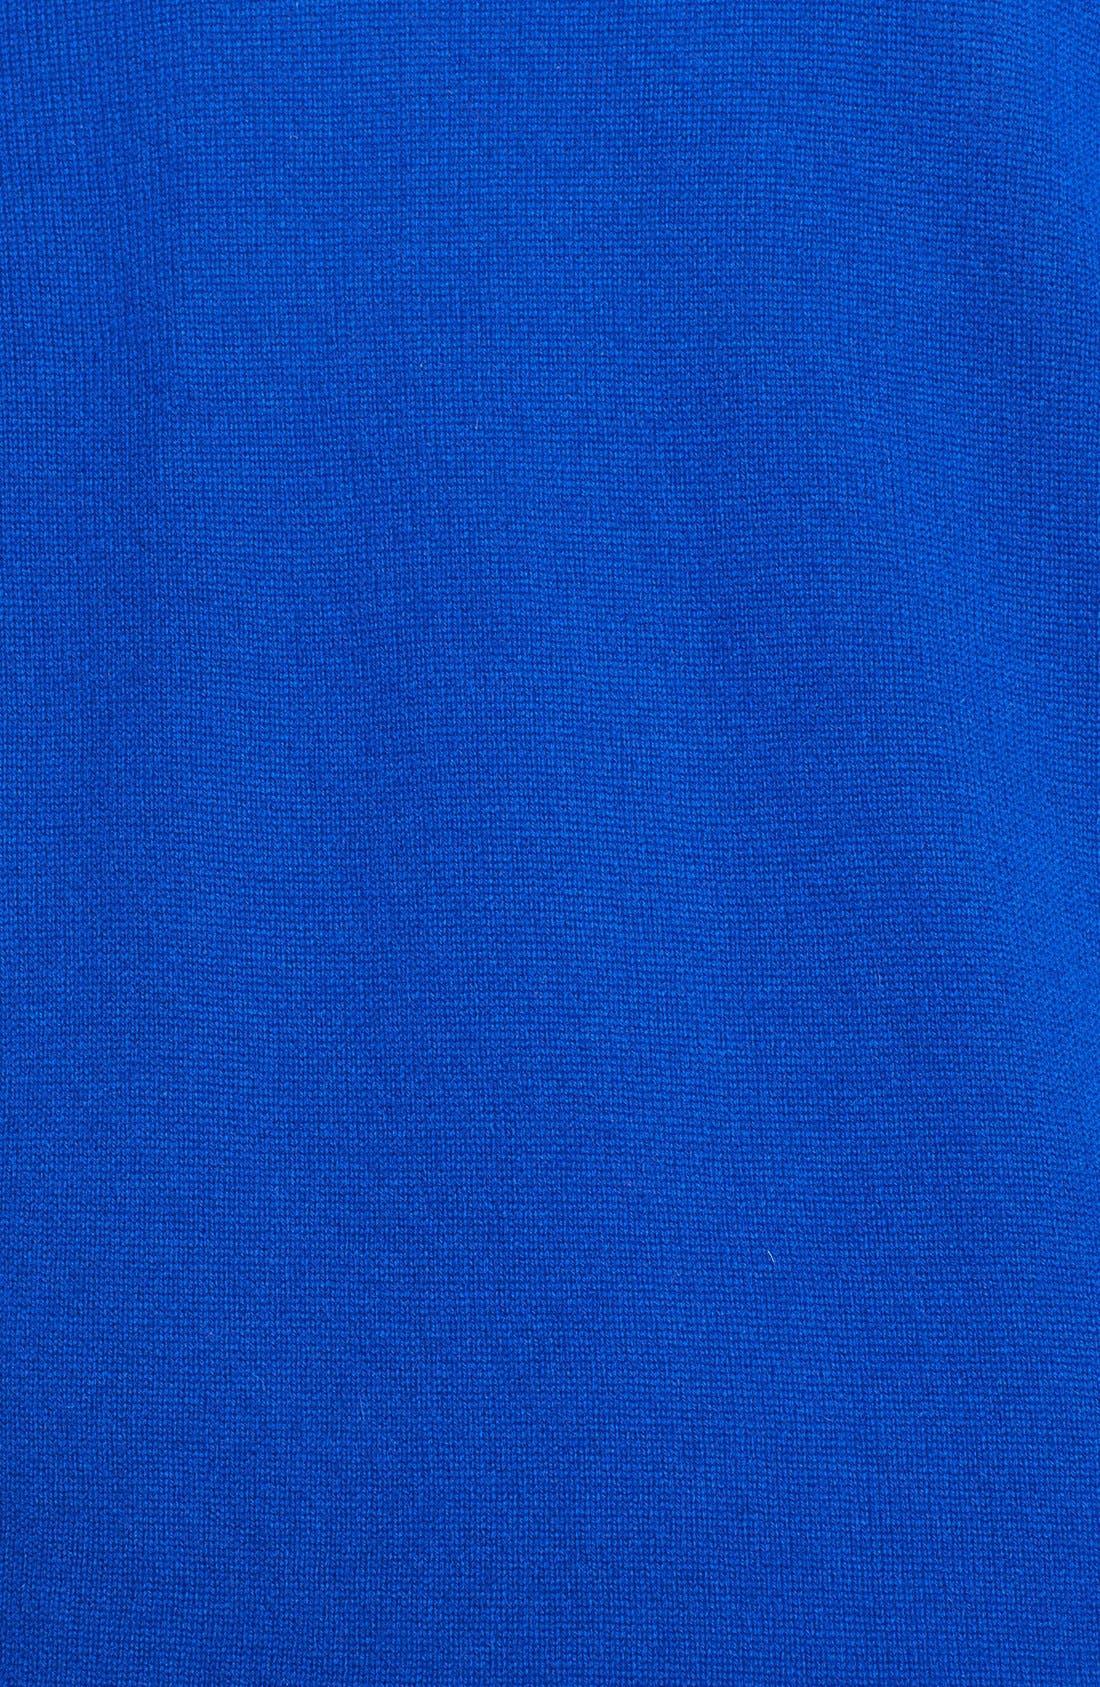 Alternate Image 3  - Caslon® Shawl Collar Wool & Cashmere Cardigan (Plus Size)